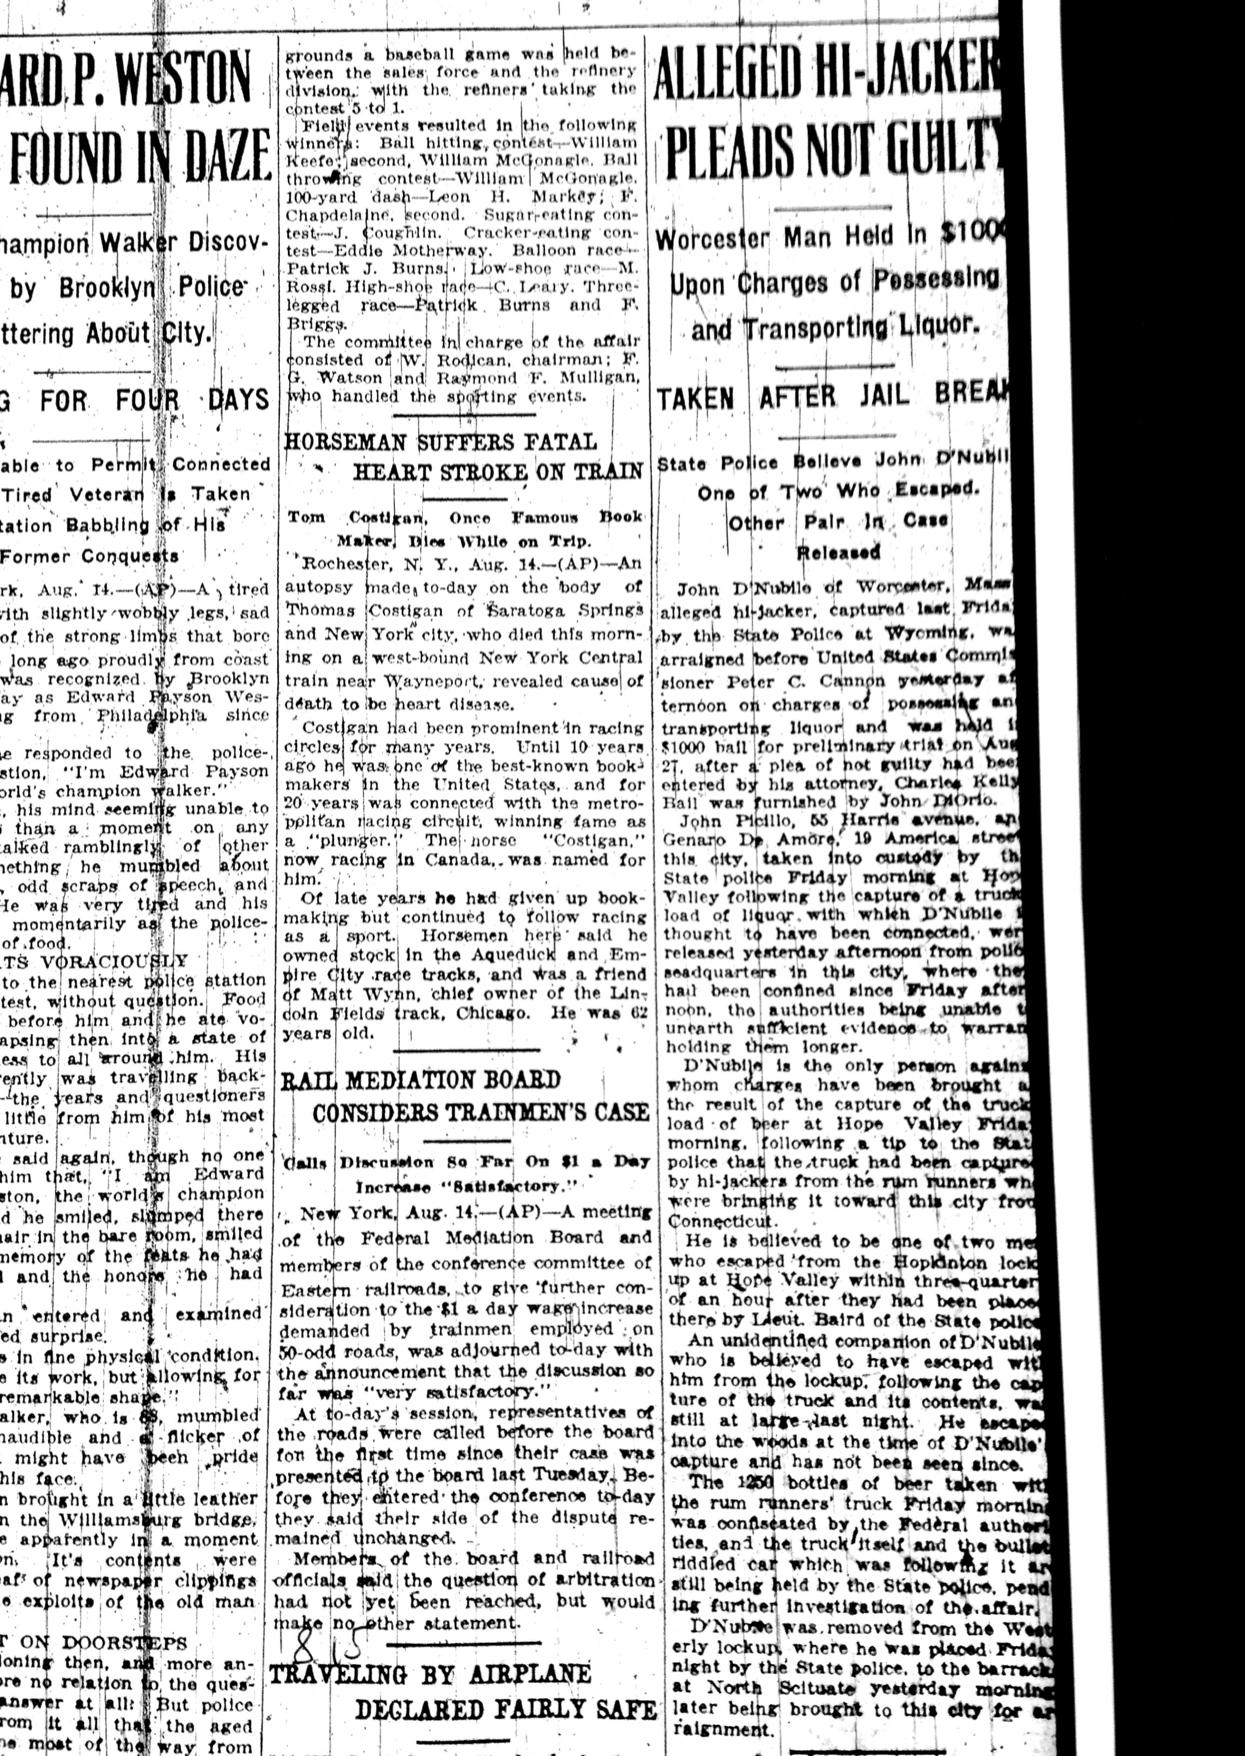 Jul 26, 1927_Highjackers plead not guilty.png